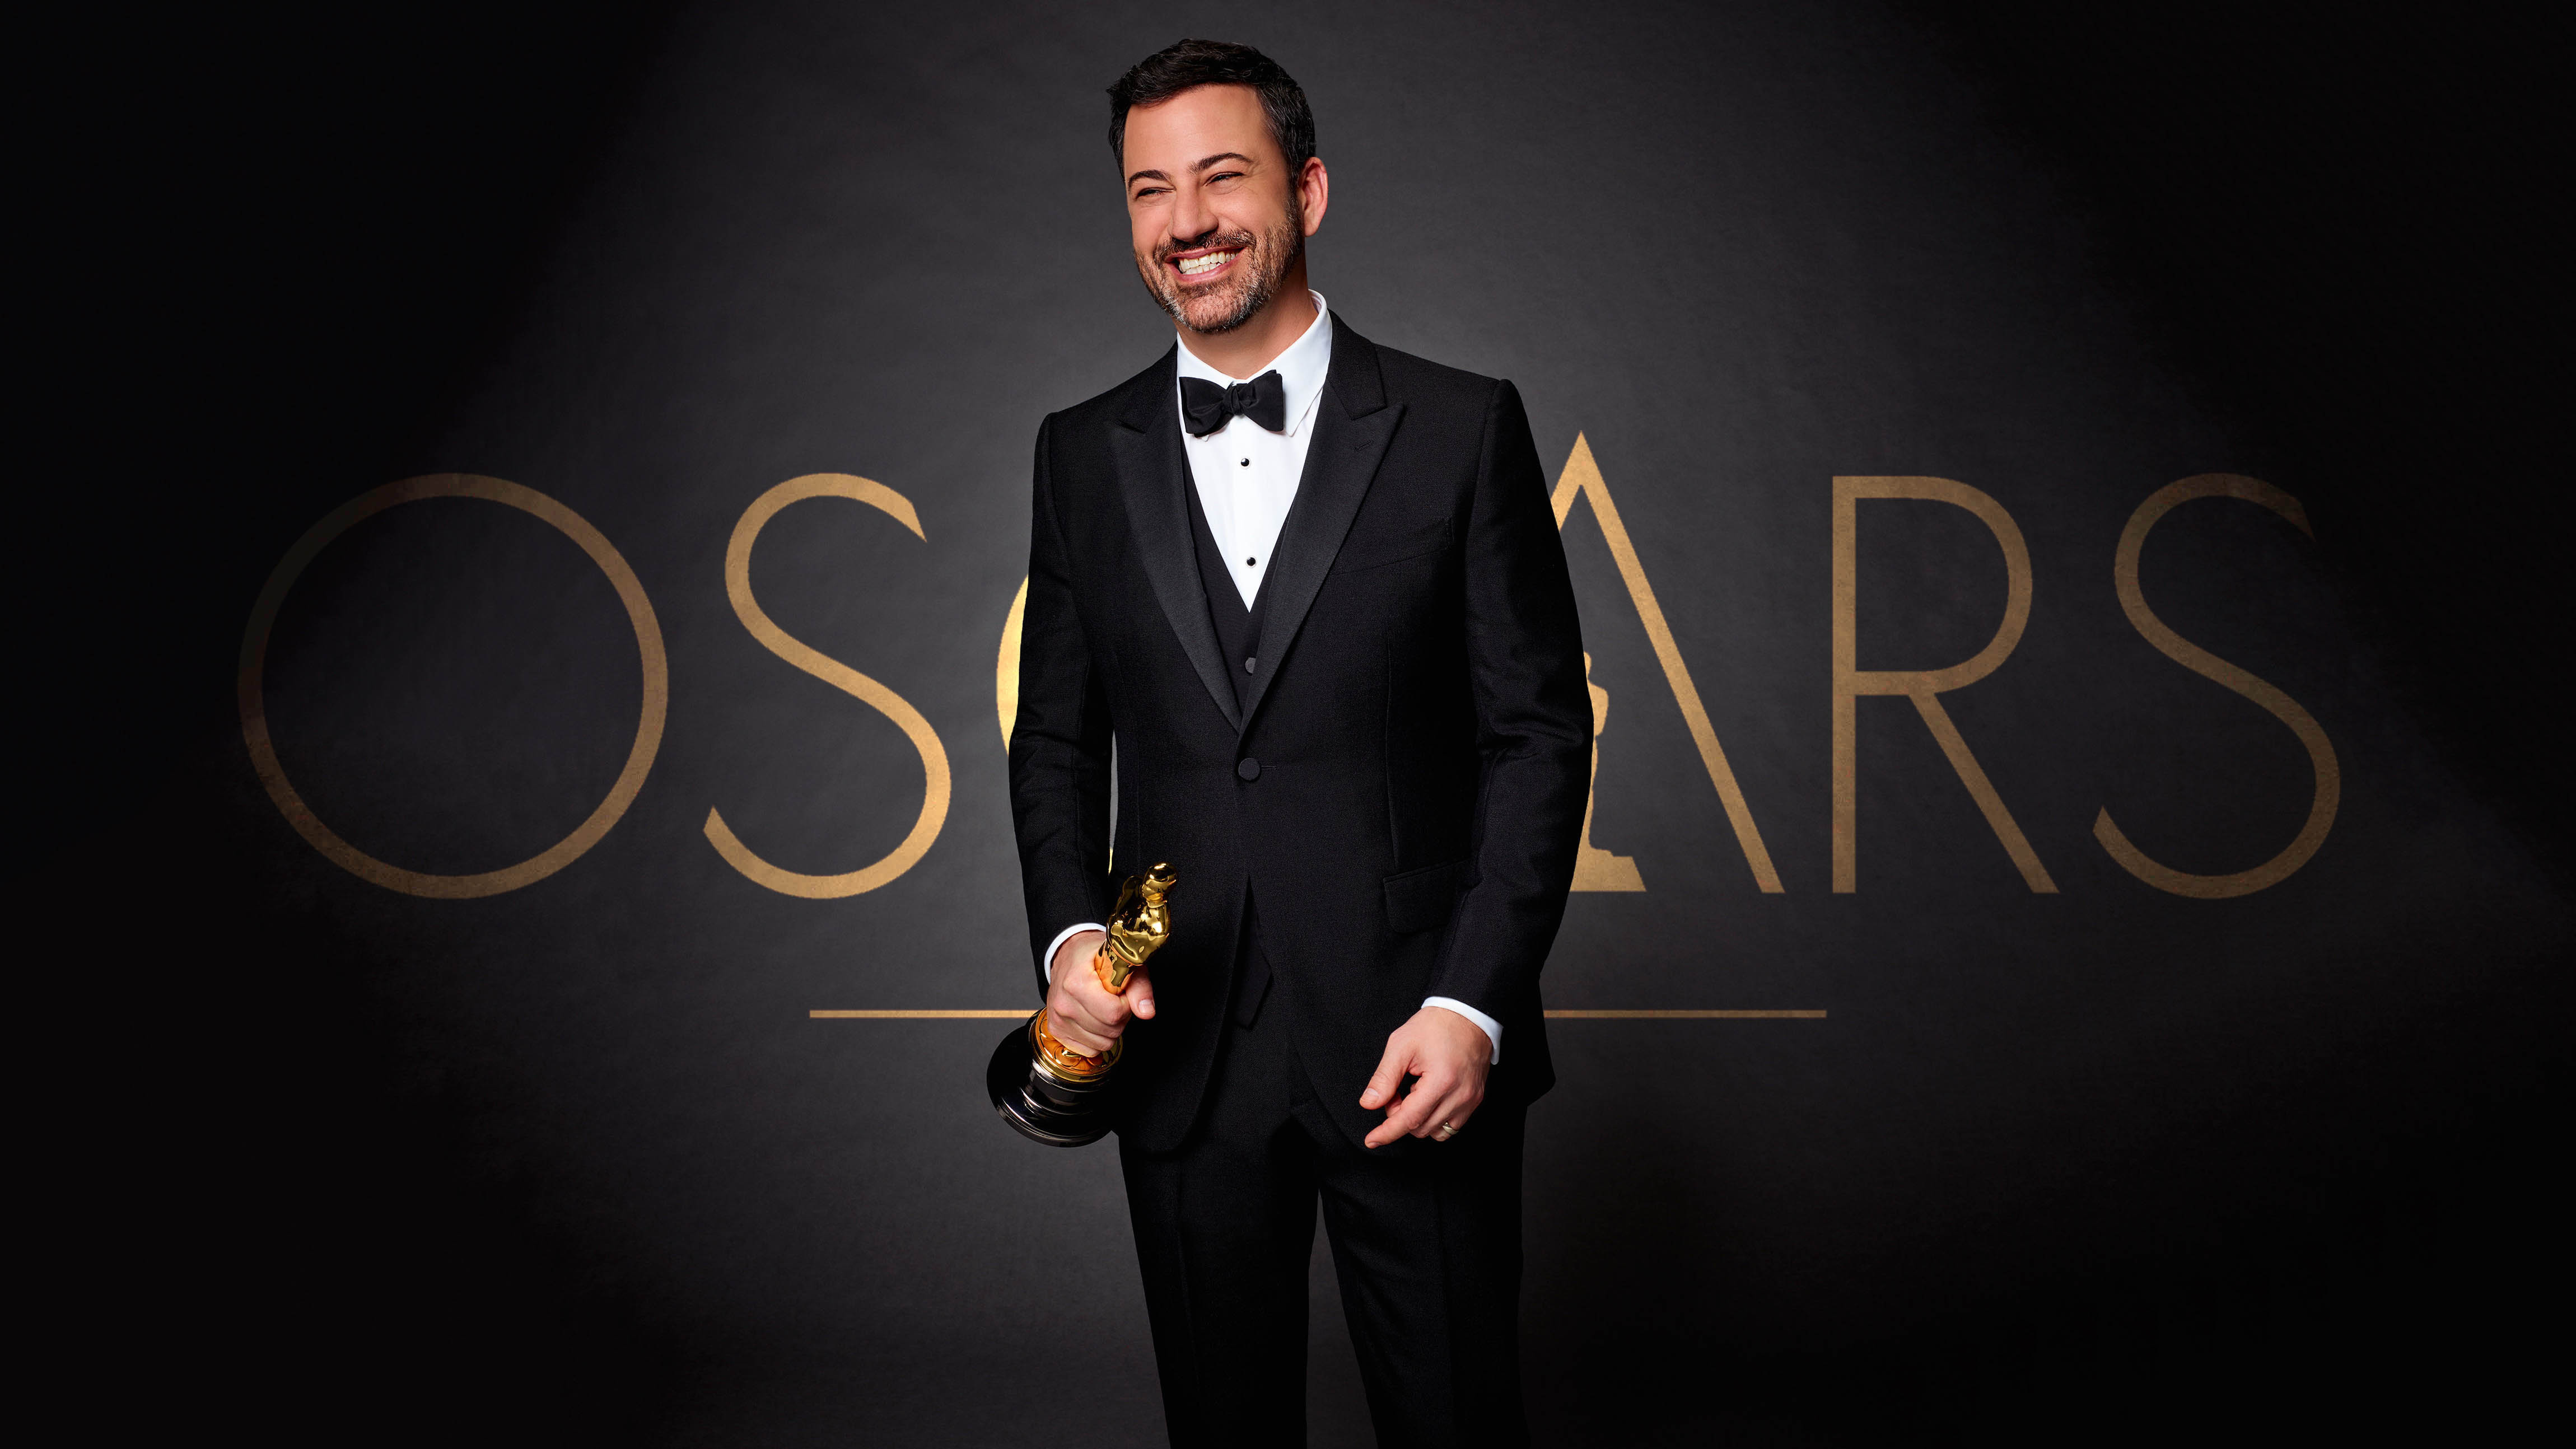 Jimmy Kimmel holding an Oscar statue